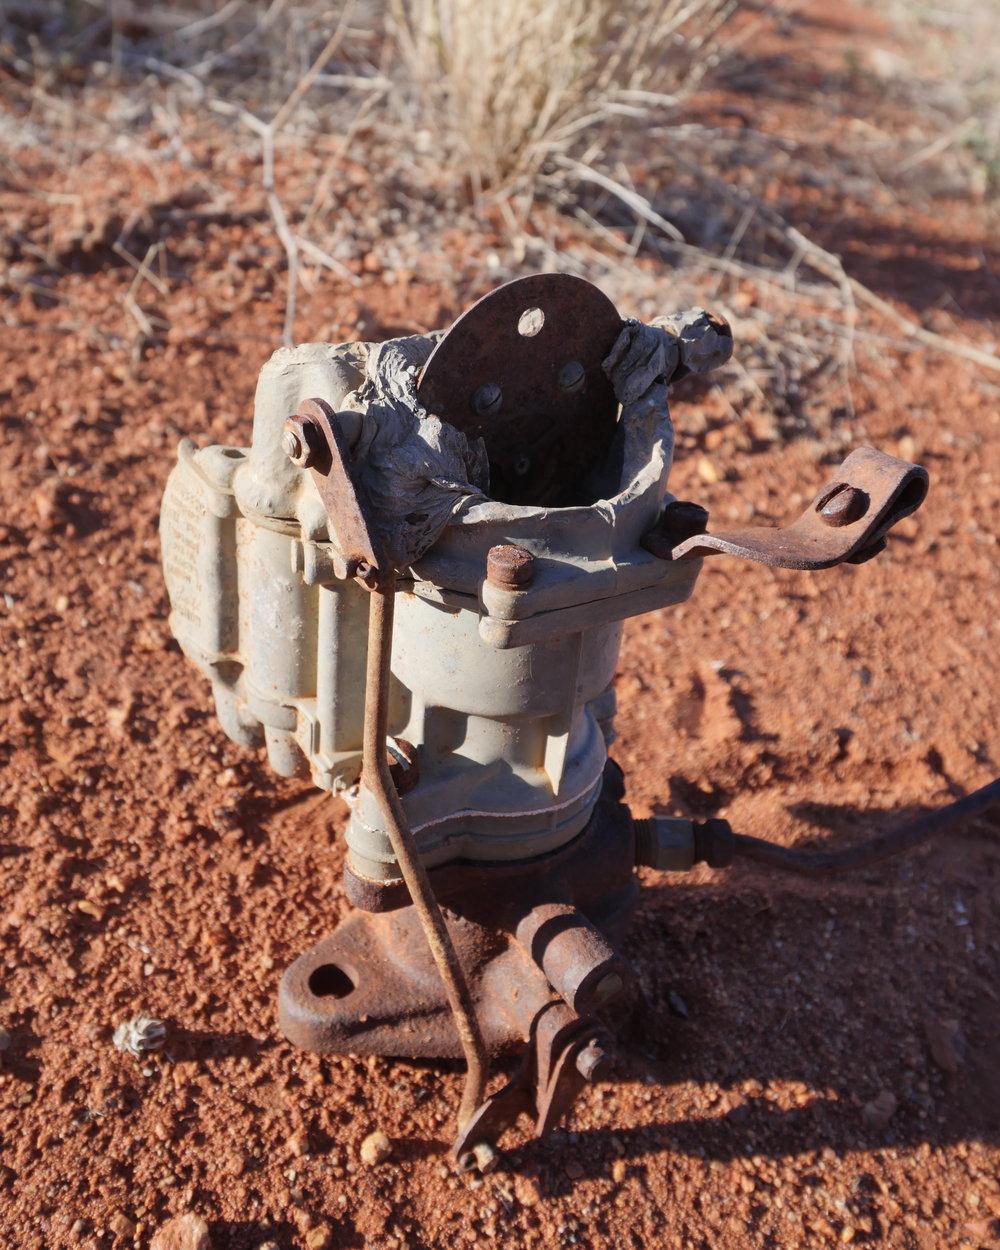 Outback mystery 3.jpg